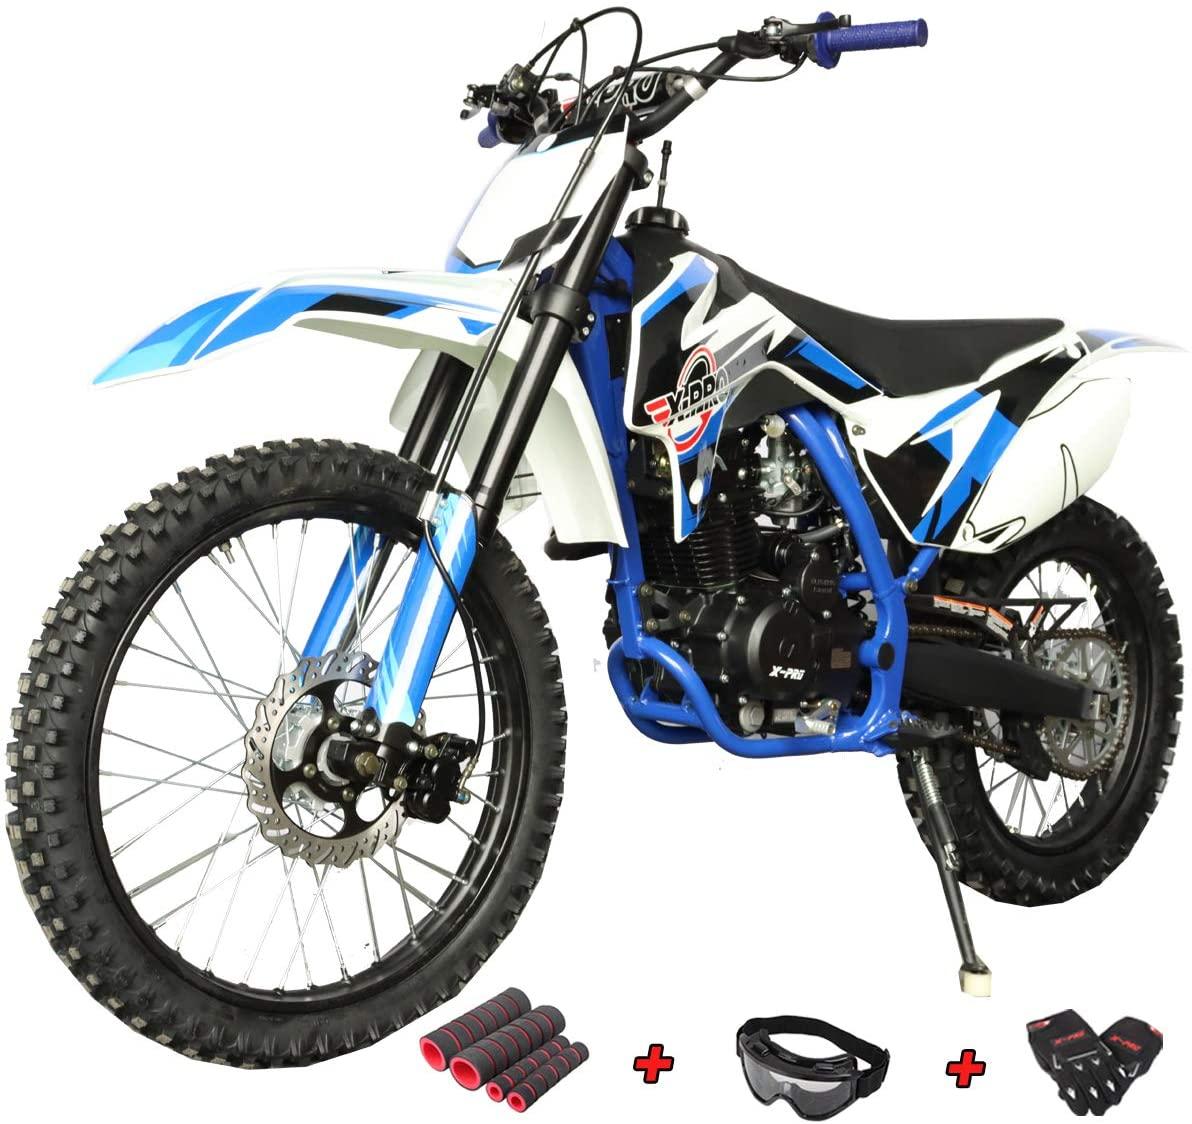 X-PRO Titan 250cc Dirt Bike Zongshen Engine Pit Bike Gas Dirt Bikes Adult Dirt Pitbike 250cc Gas Dirt Pit Bike, Big 21